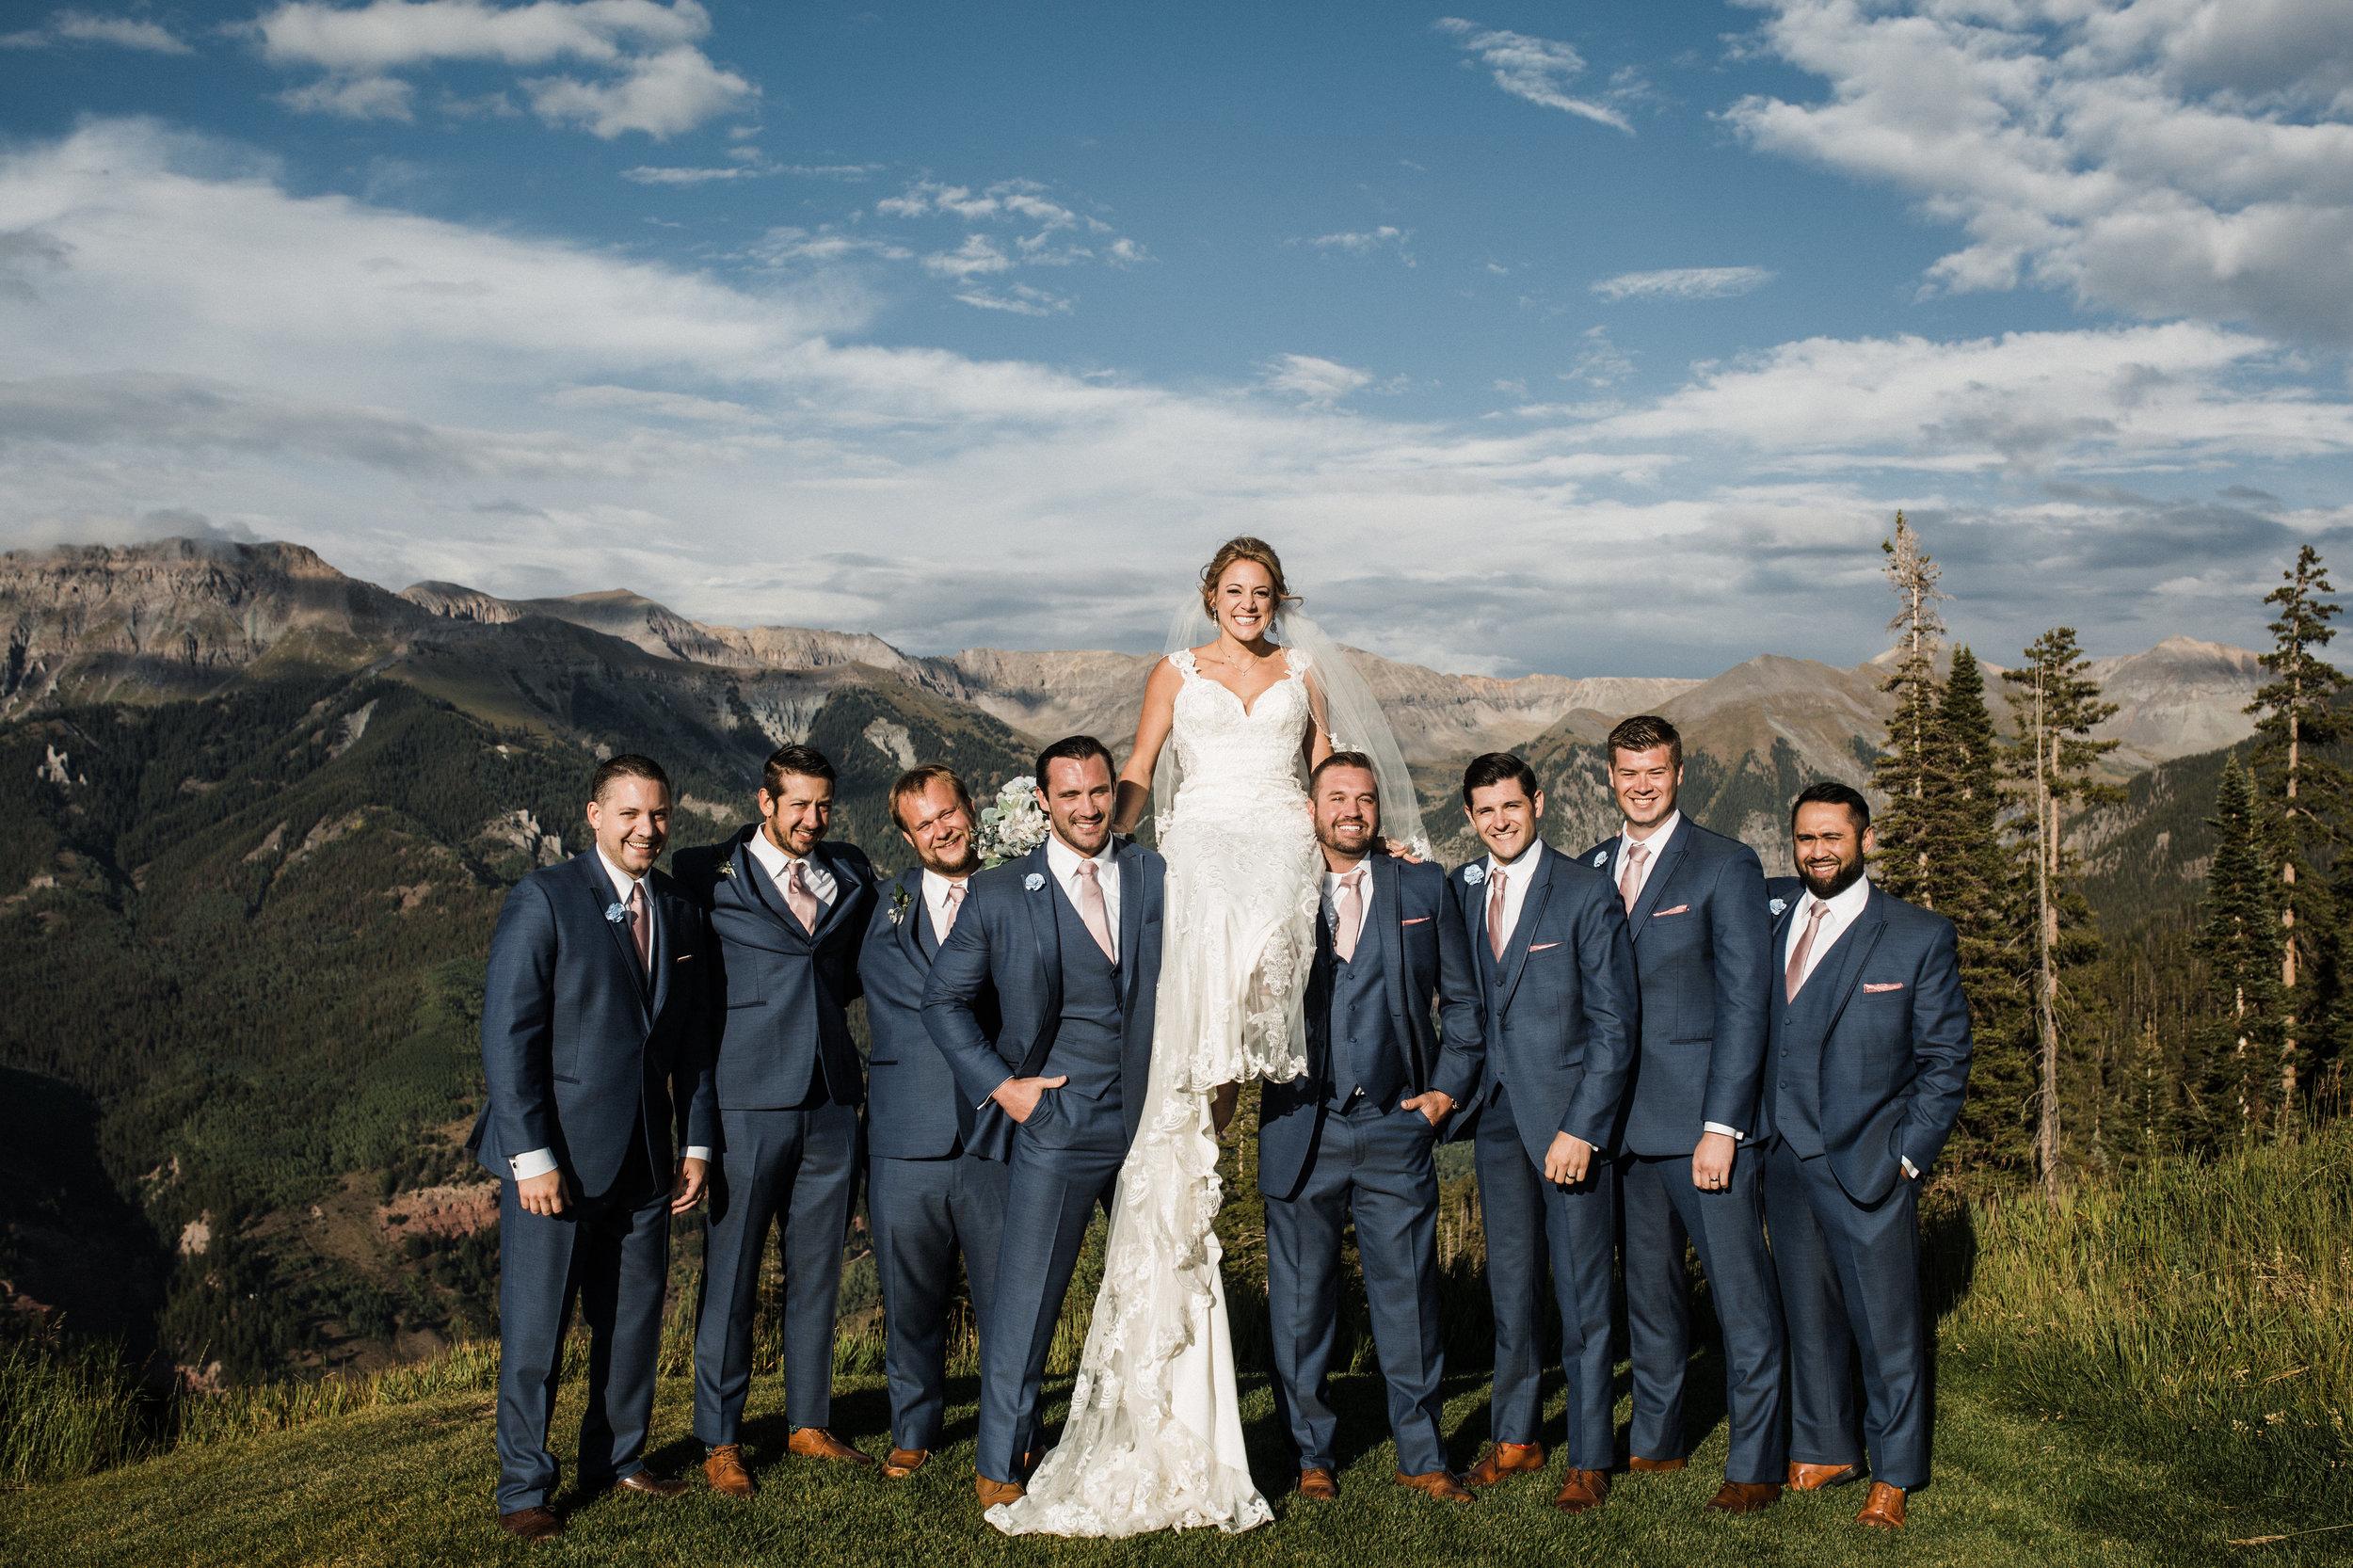 leahandashton-telluride-wedding-photography-0069.jpg